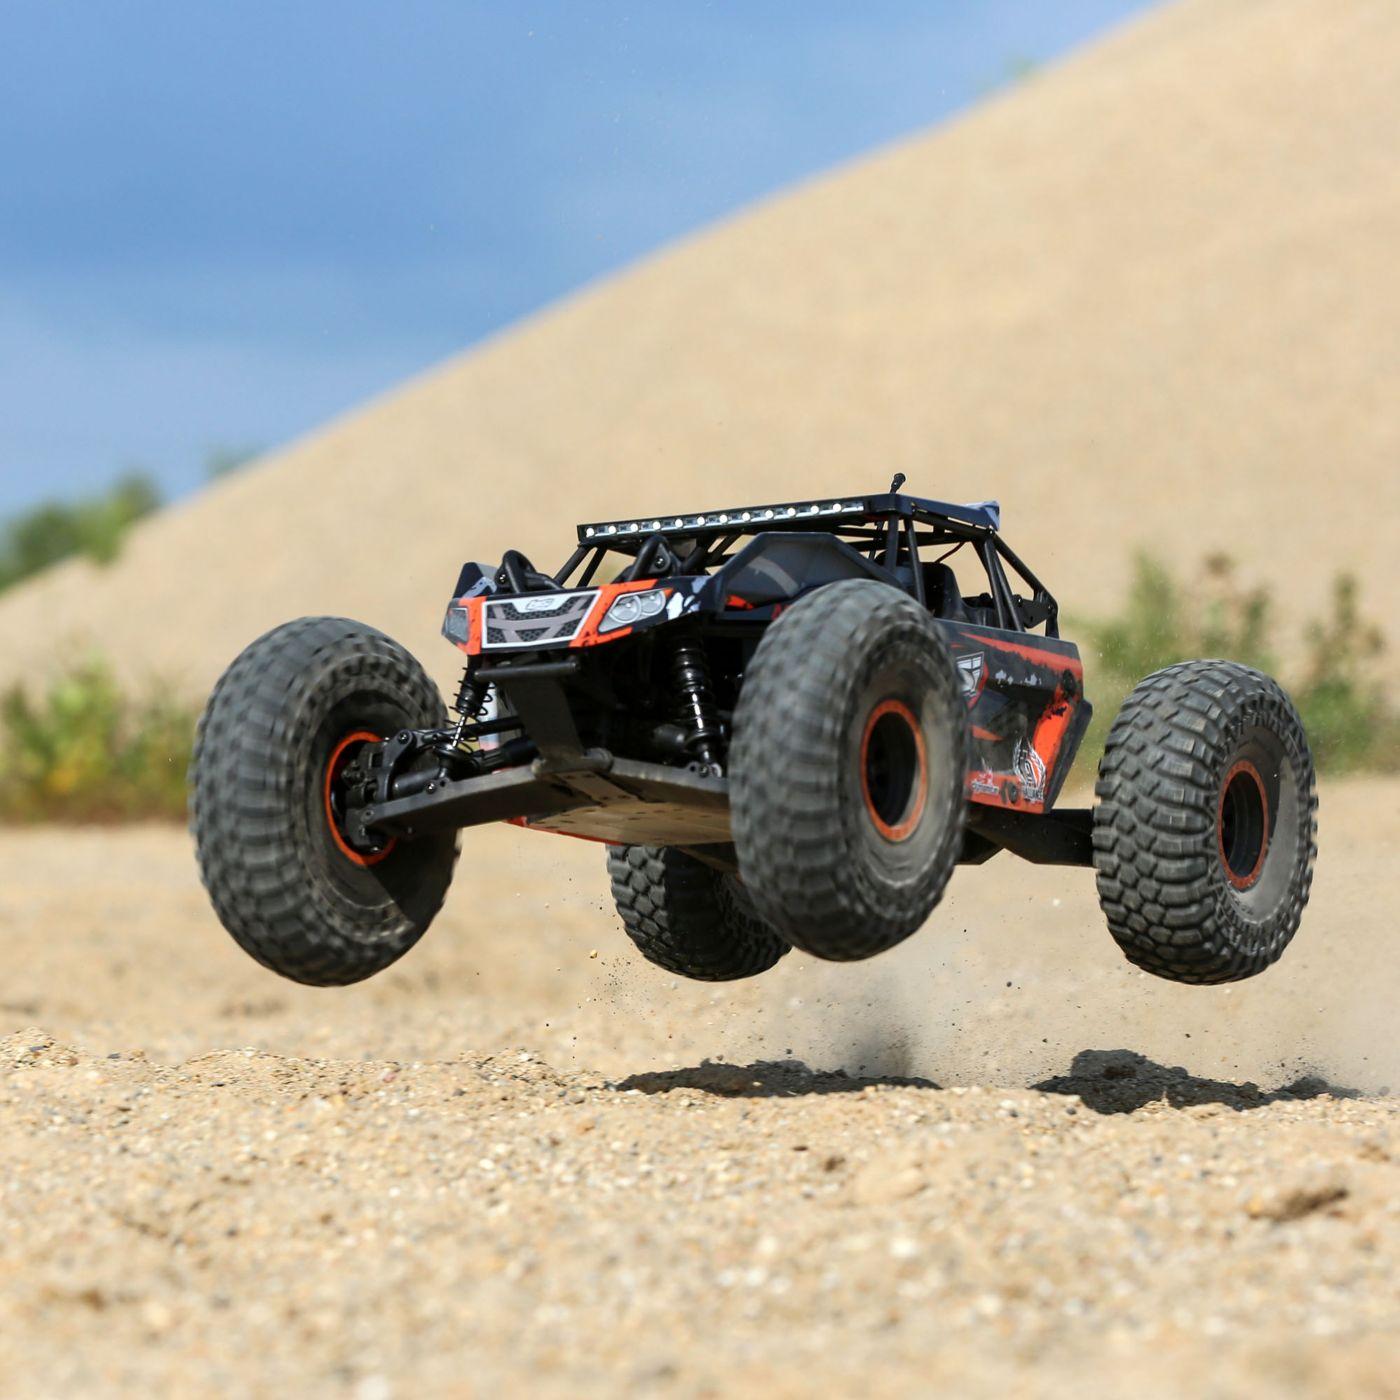 Losi Rock Rey Buggy Rock Racer brushless avc bnd 8